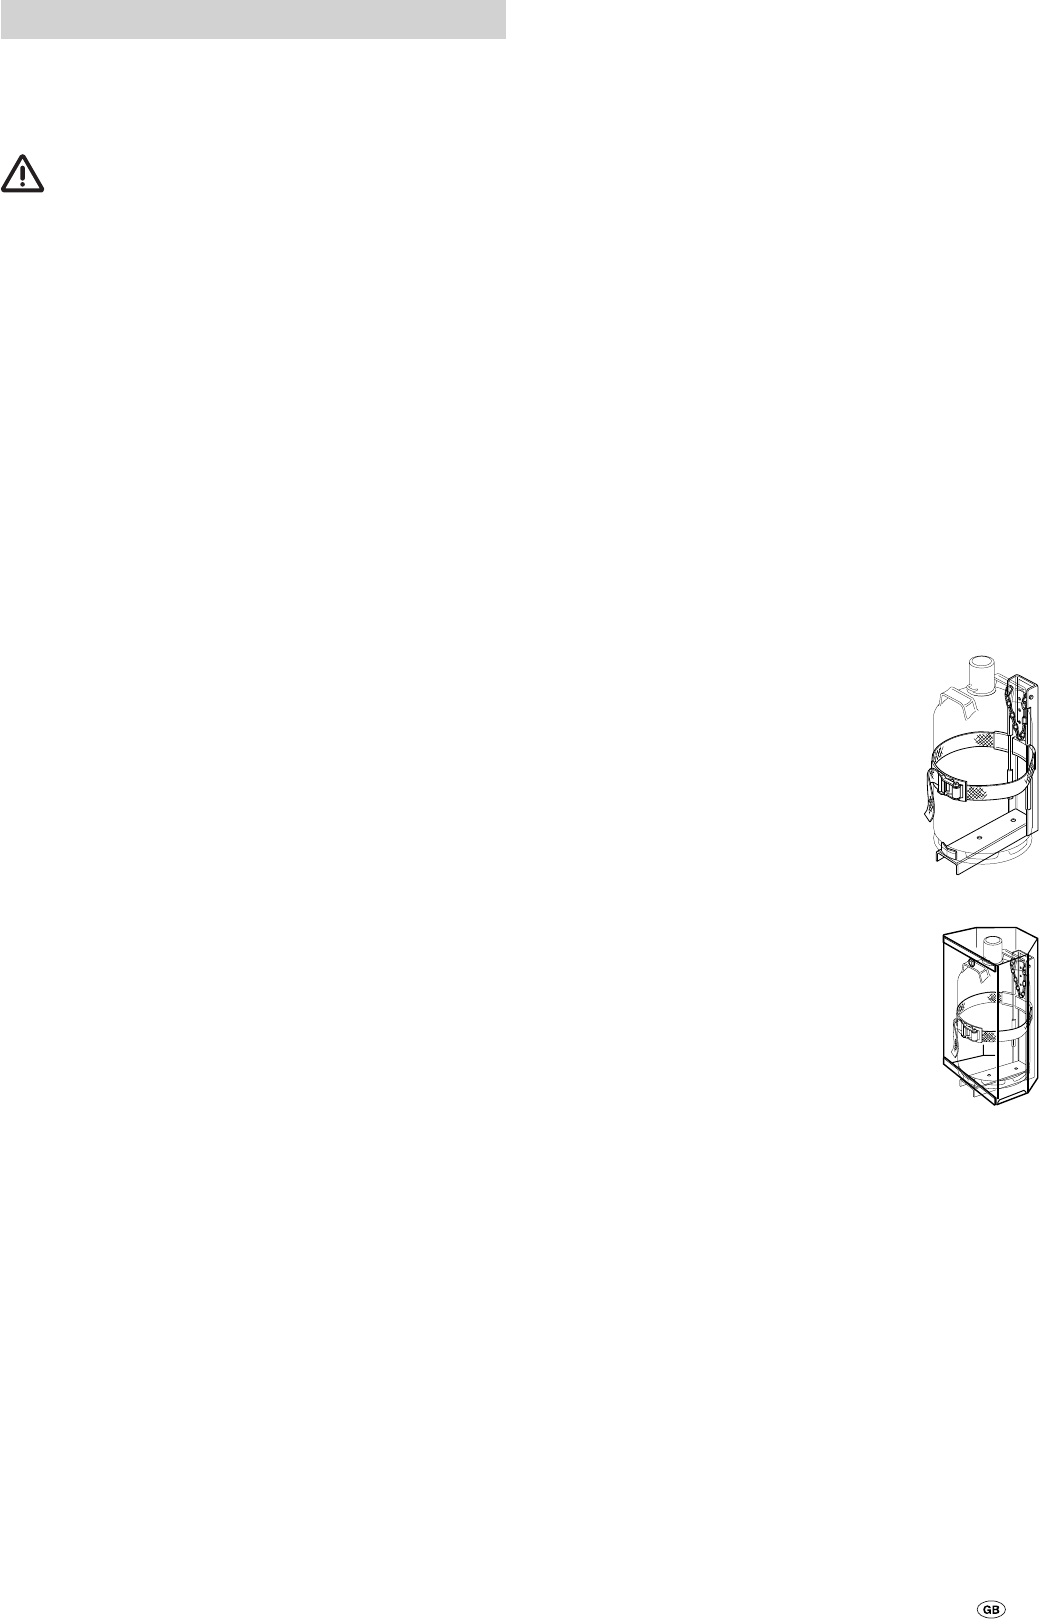 Handleiding Trumatic E 4000 A (pagina 21 van 88) (Dansk, Deutsch ...